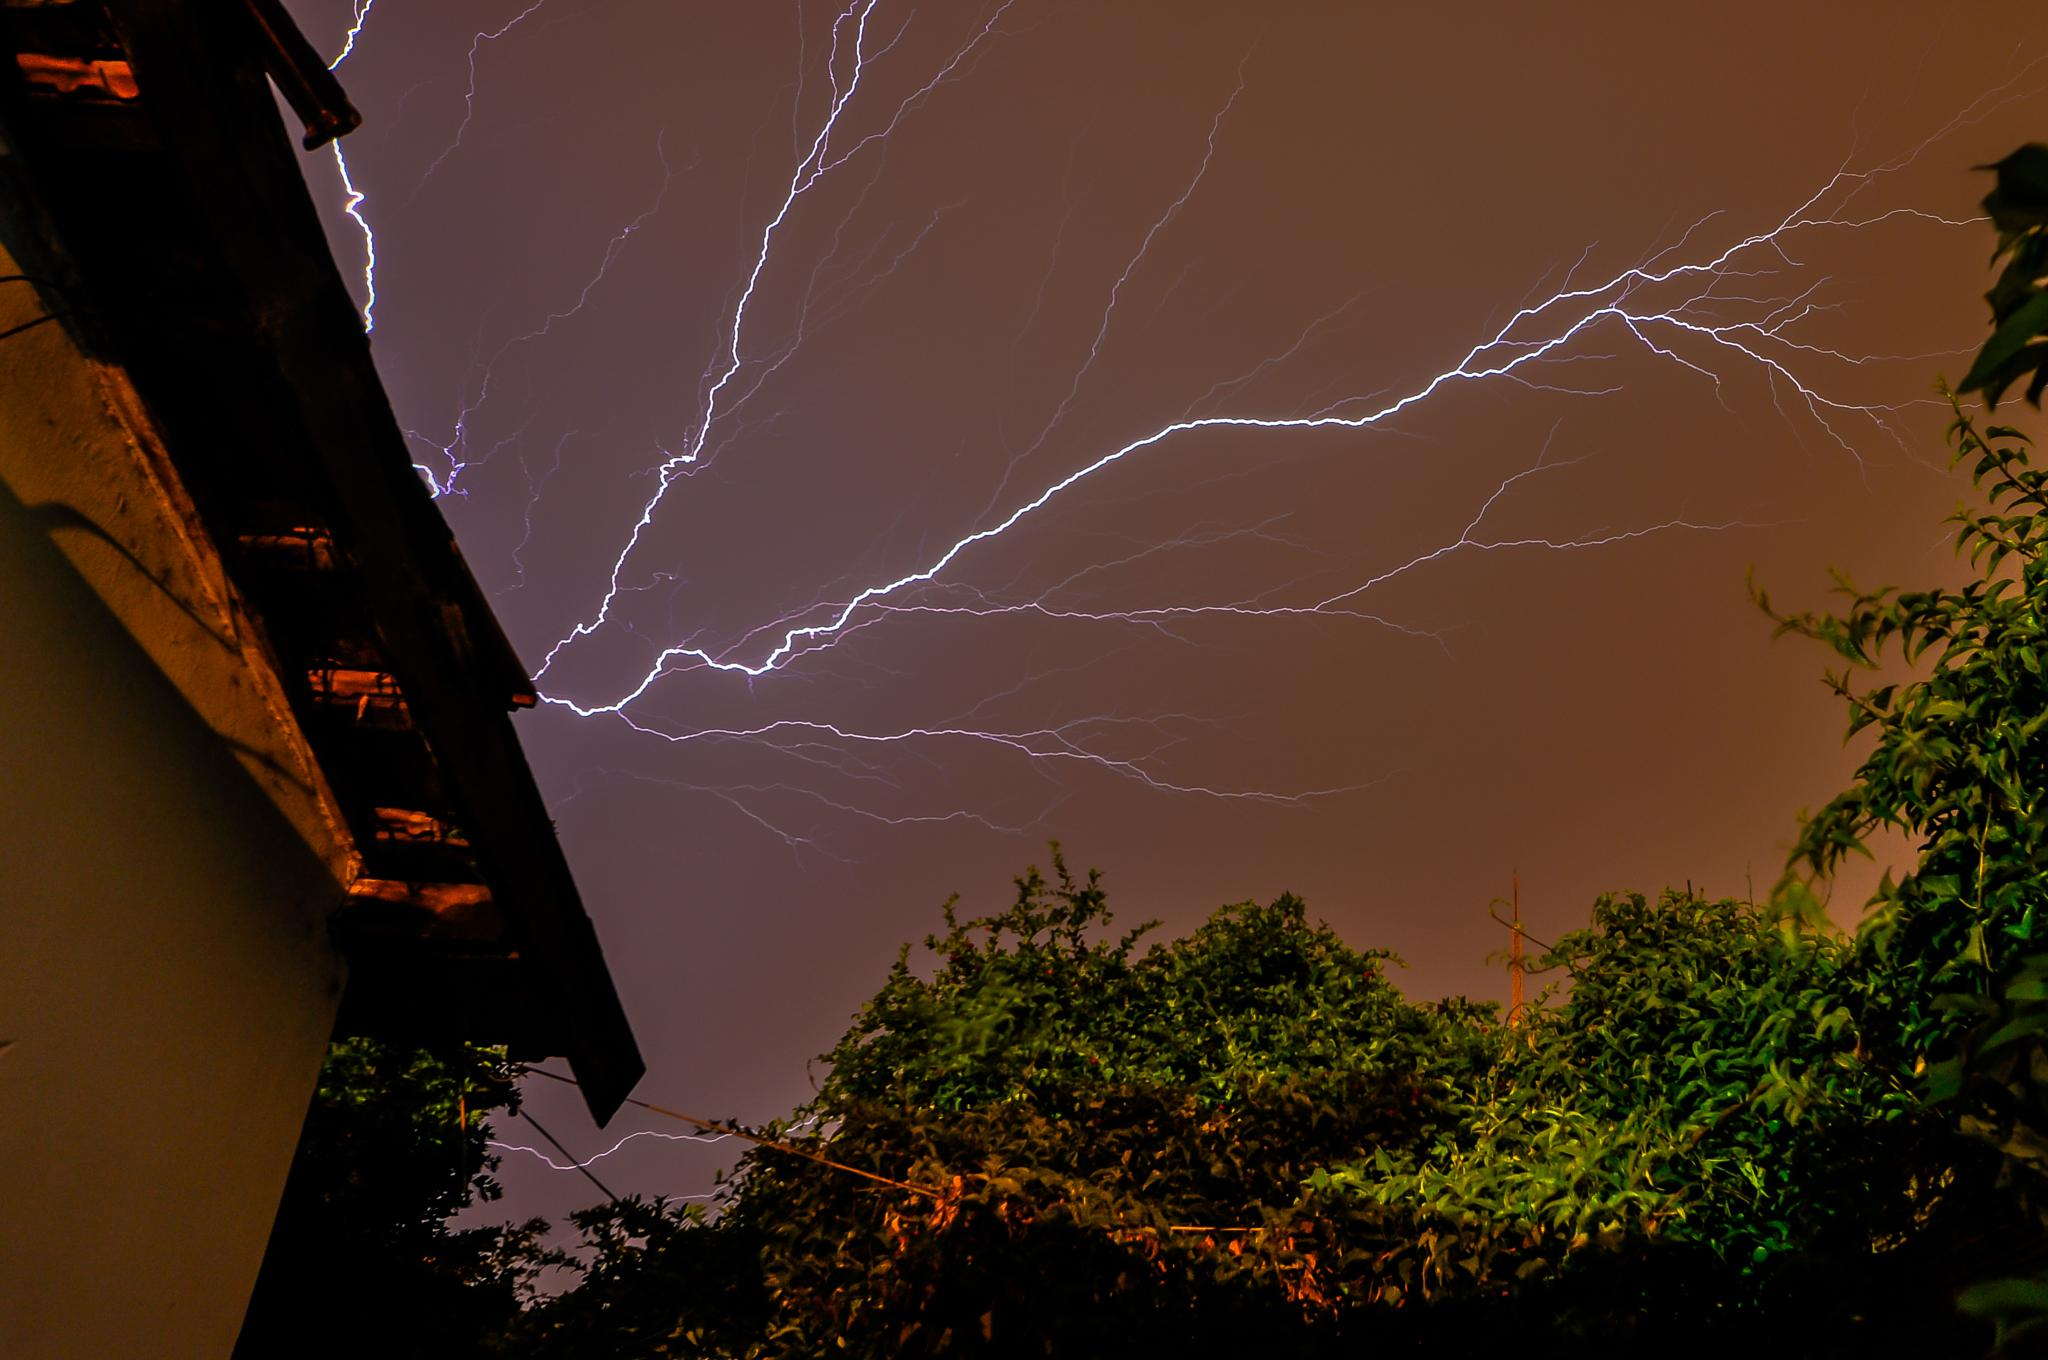 Thunder by Marcelo Calazans